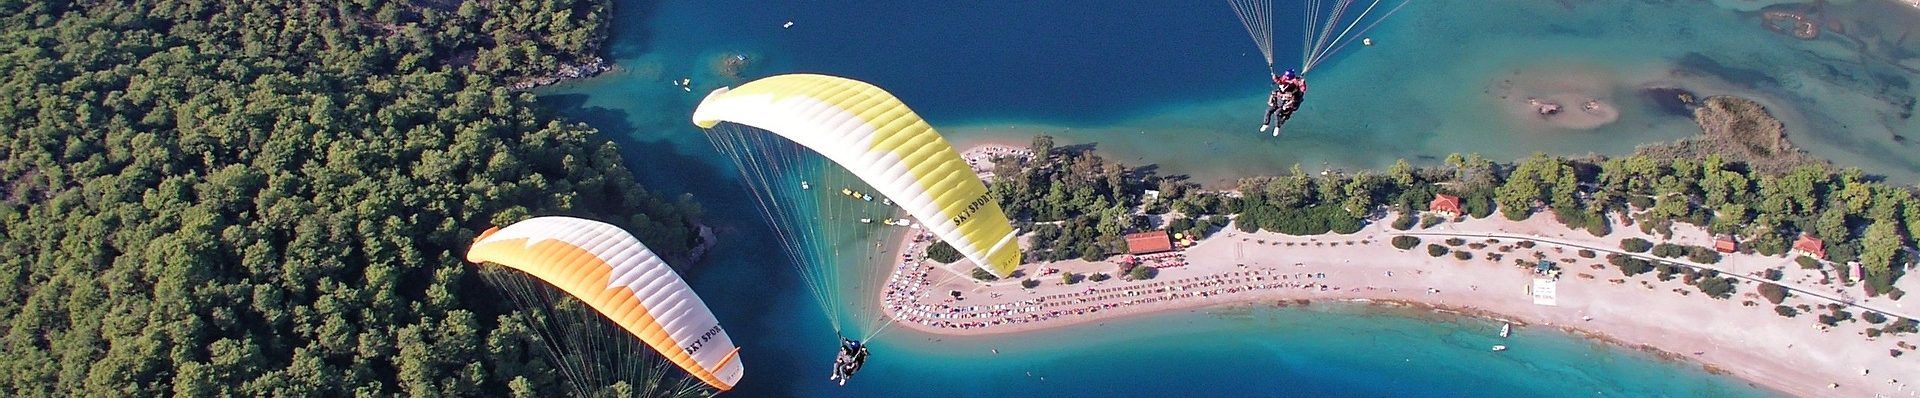 paragliding-1220000_1920